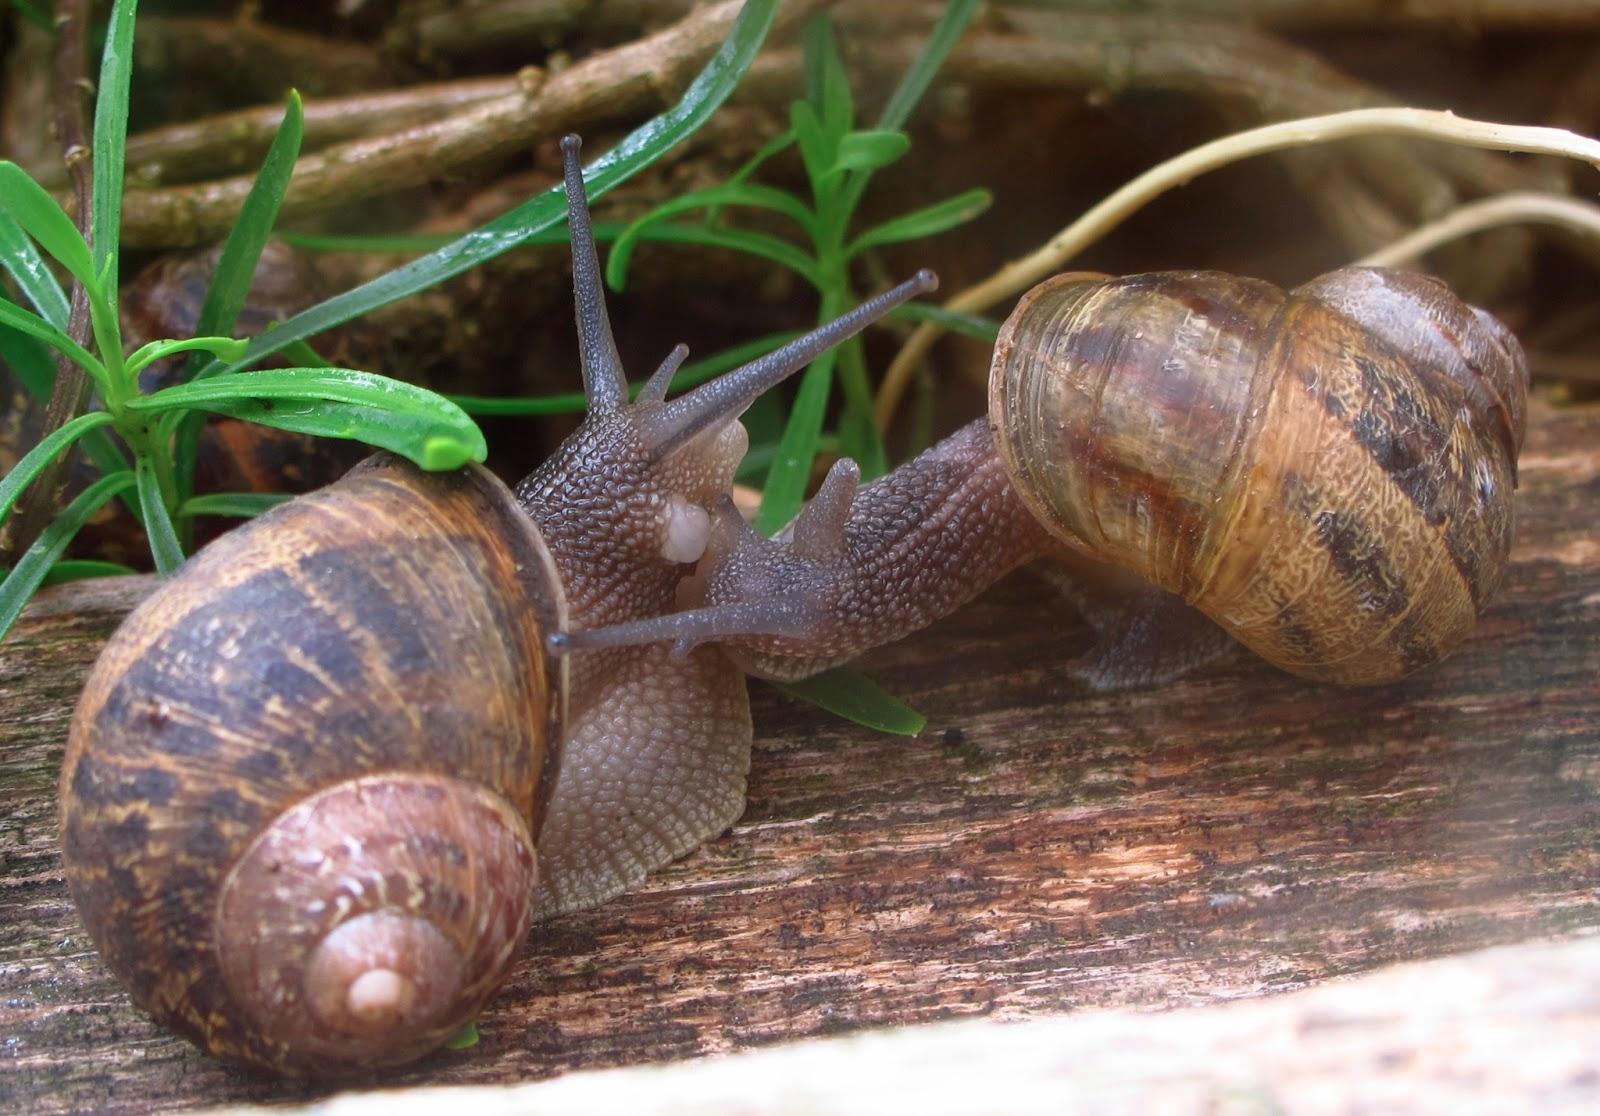 how to eat garden snails